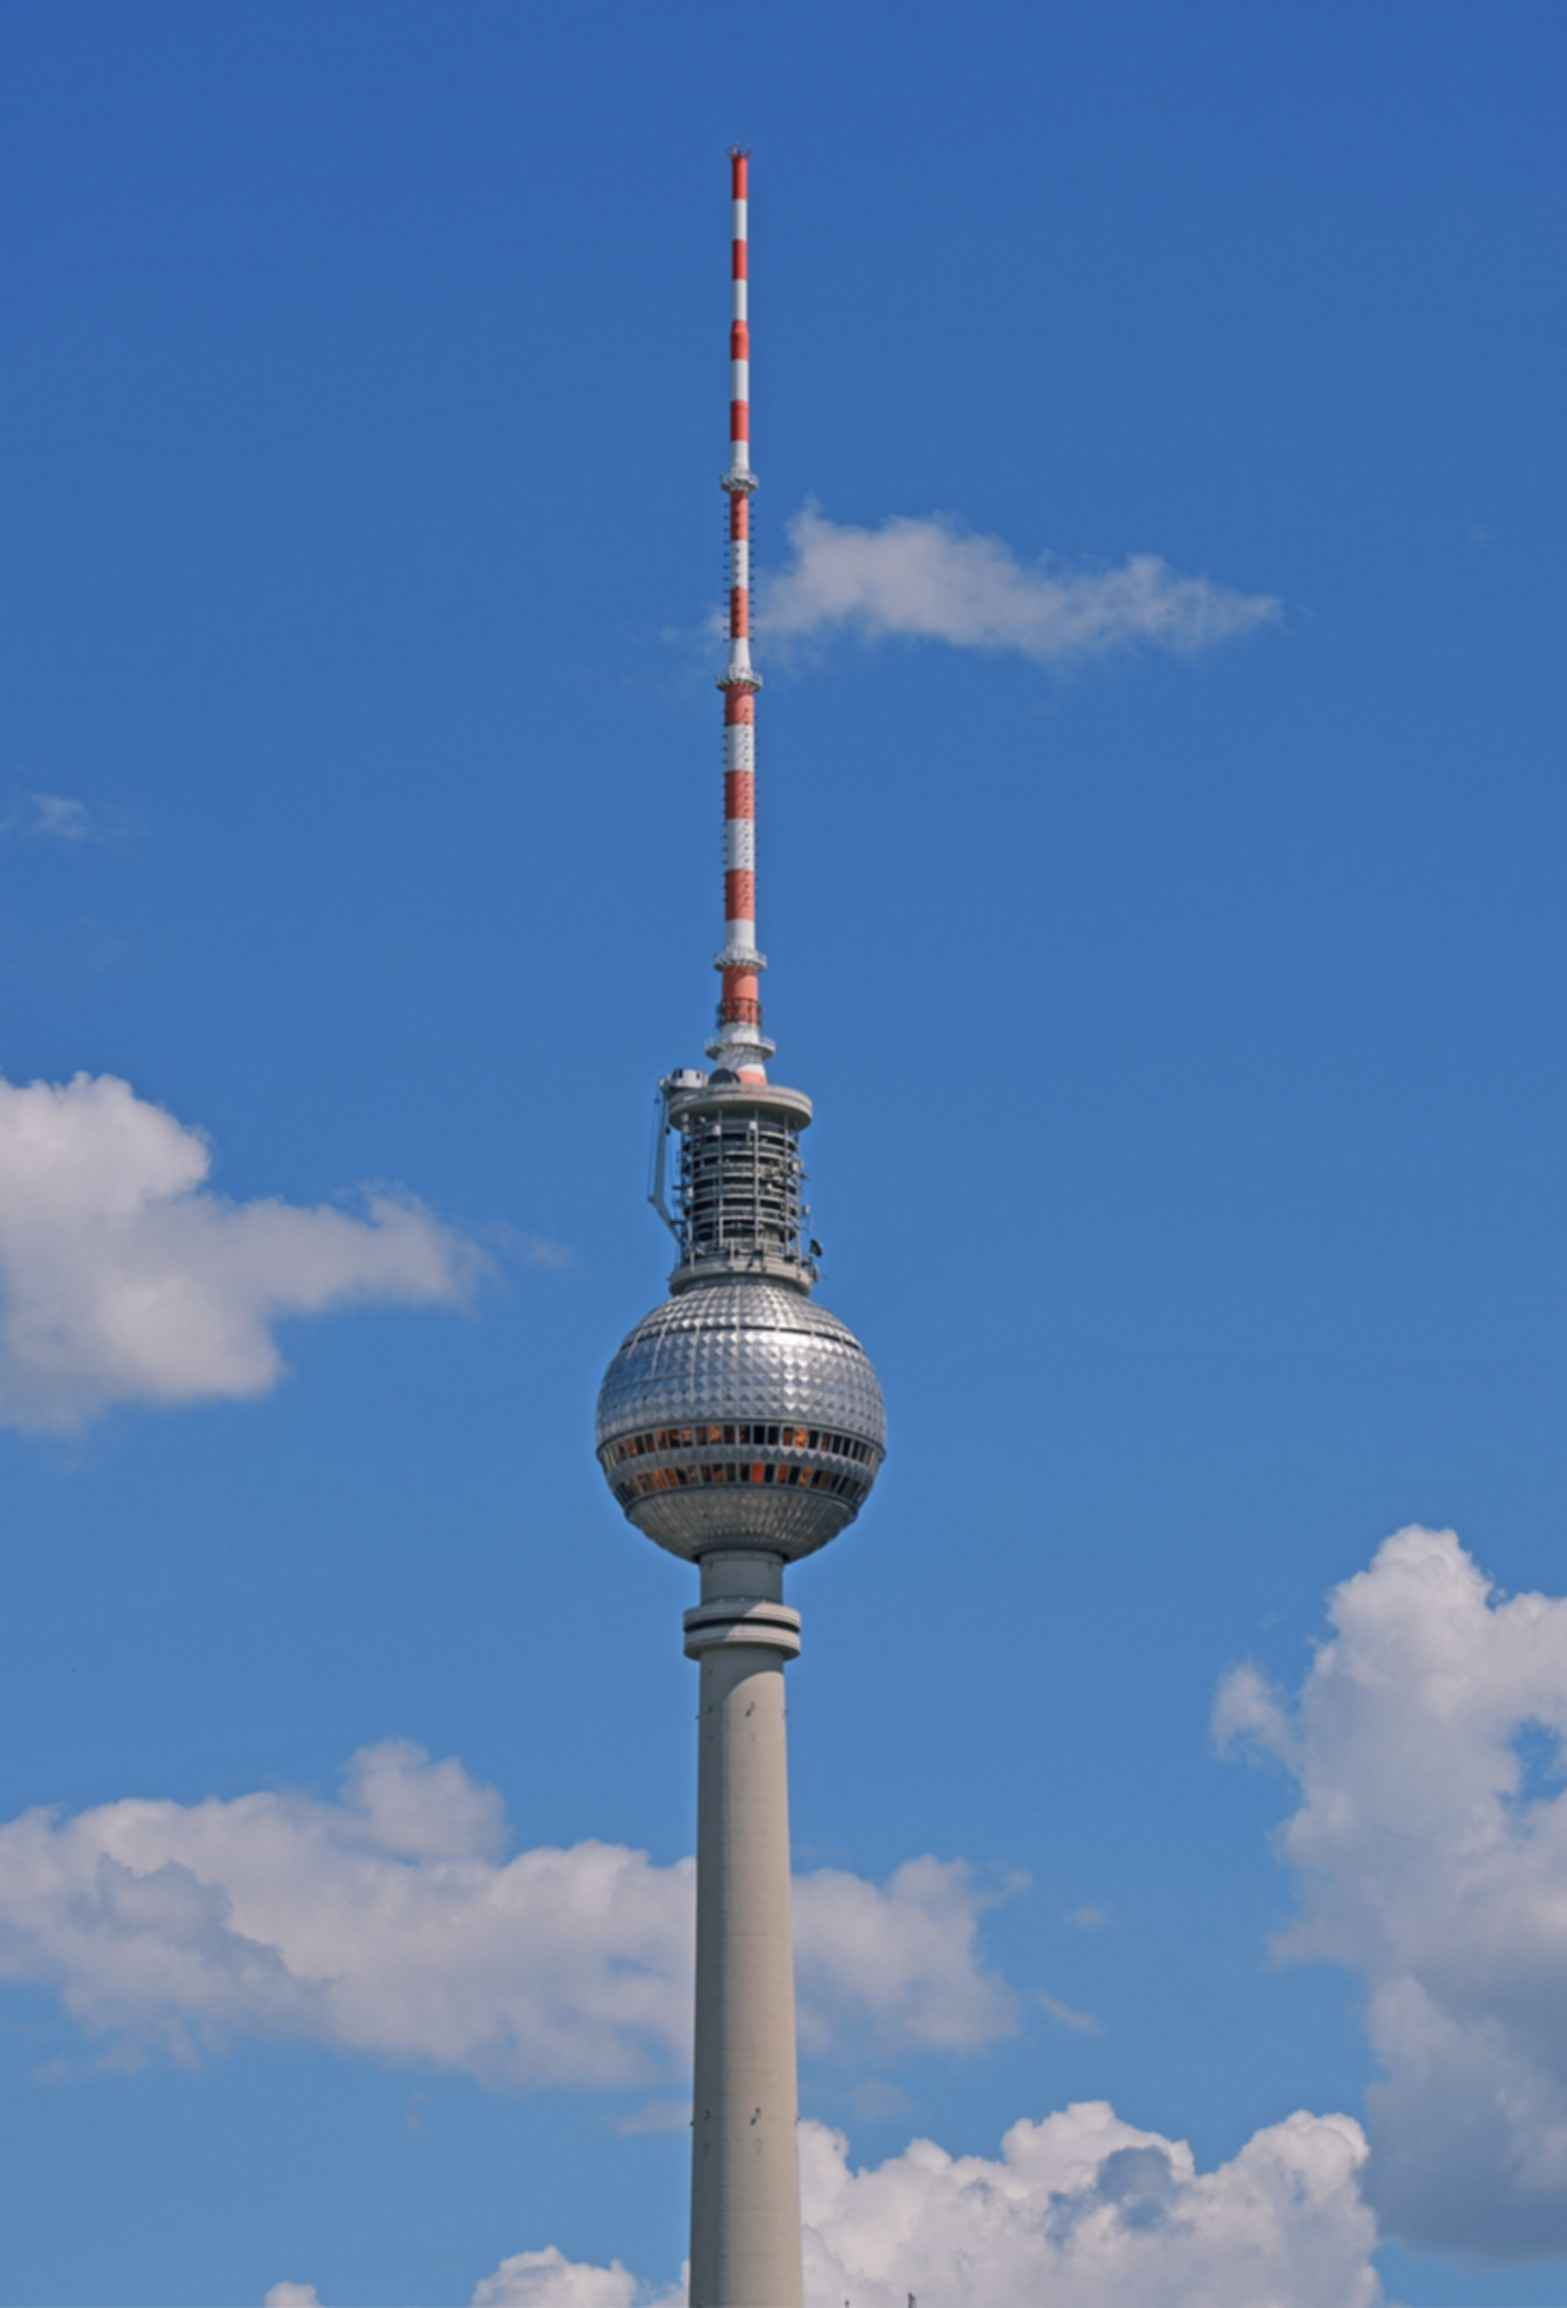 Berlin Sky Tower - Exterior